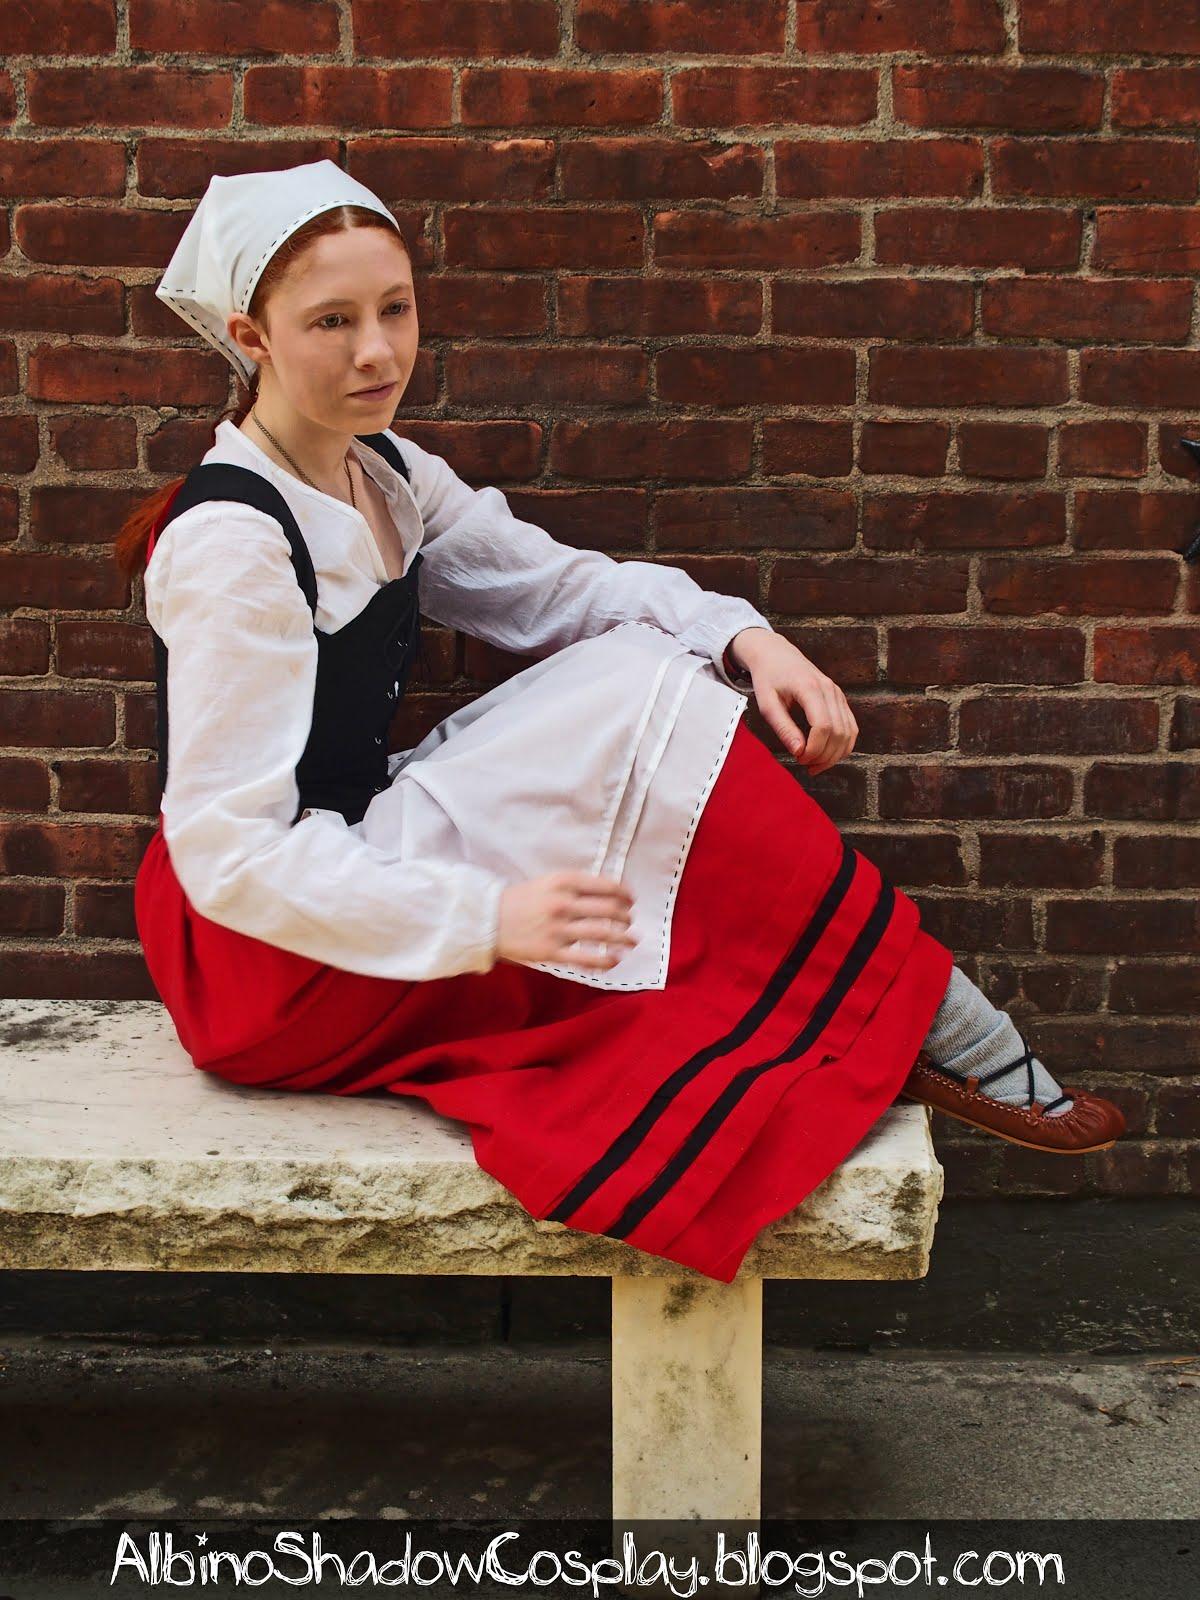 Albinoshadow Cosplay: Basque Dance Costume Photo Gallery